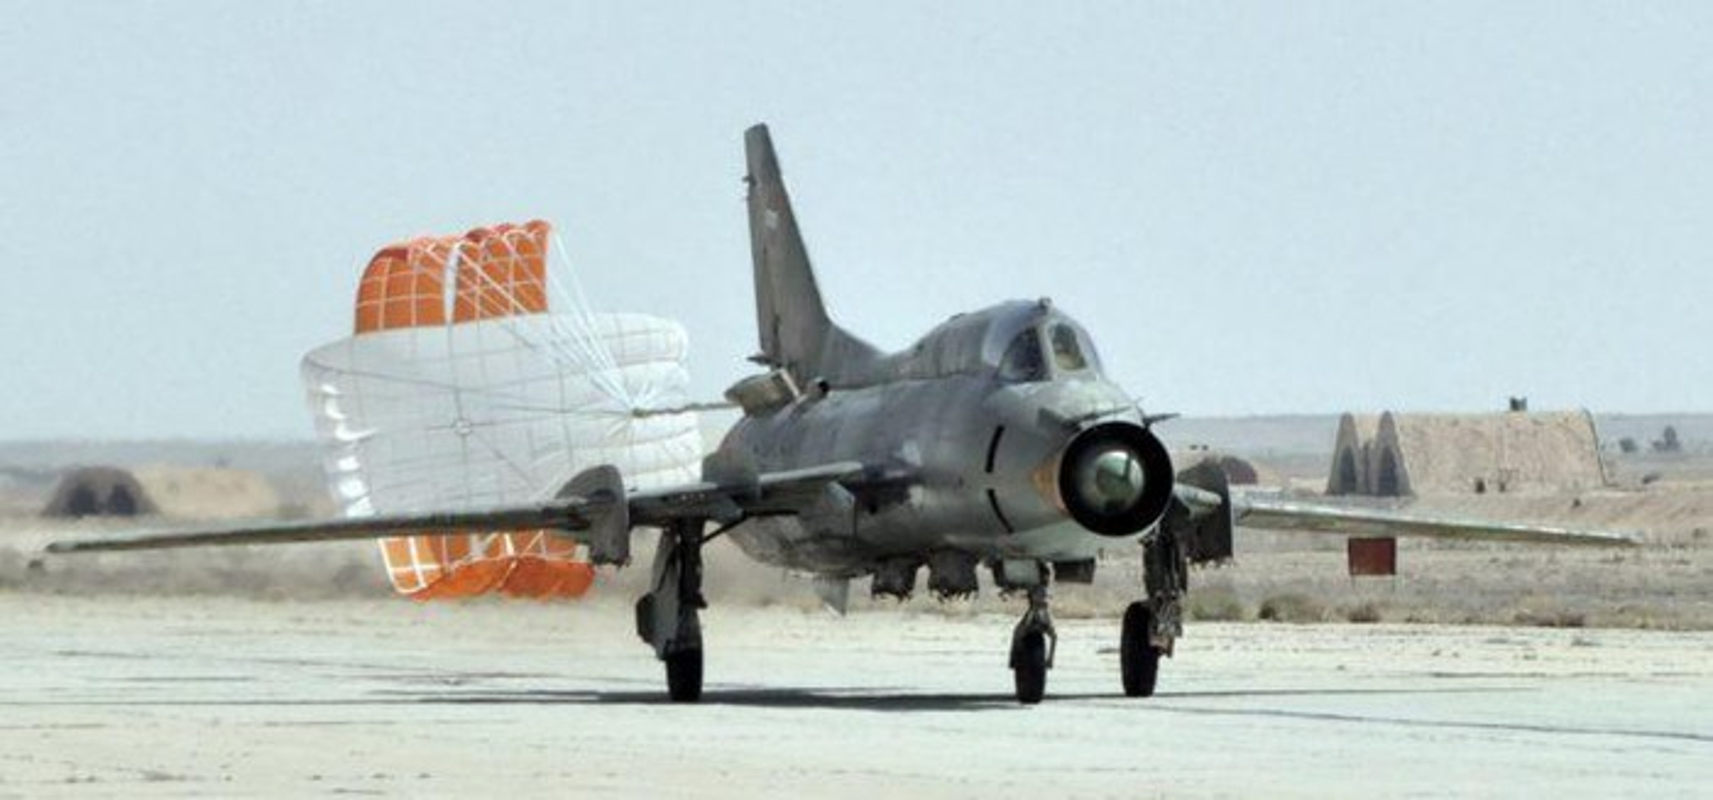 Toan canh vu Su-22 Syria bi phong khong Israel ban ha moi nhat-Hinh-12